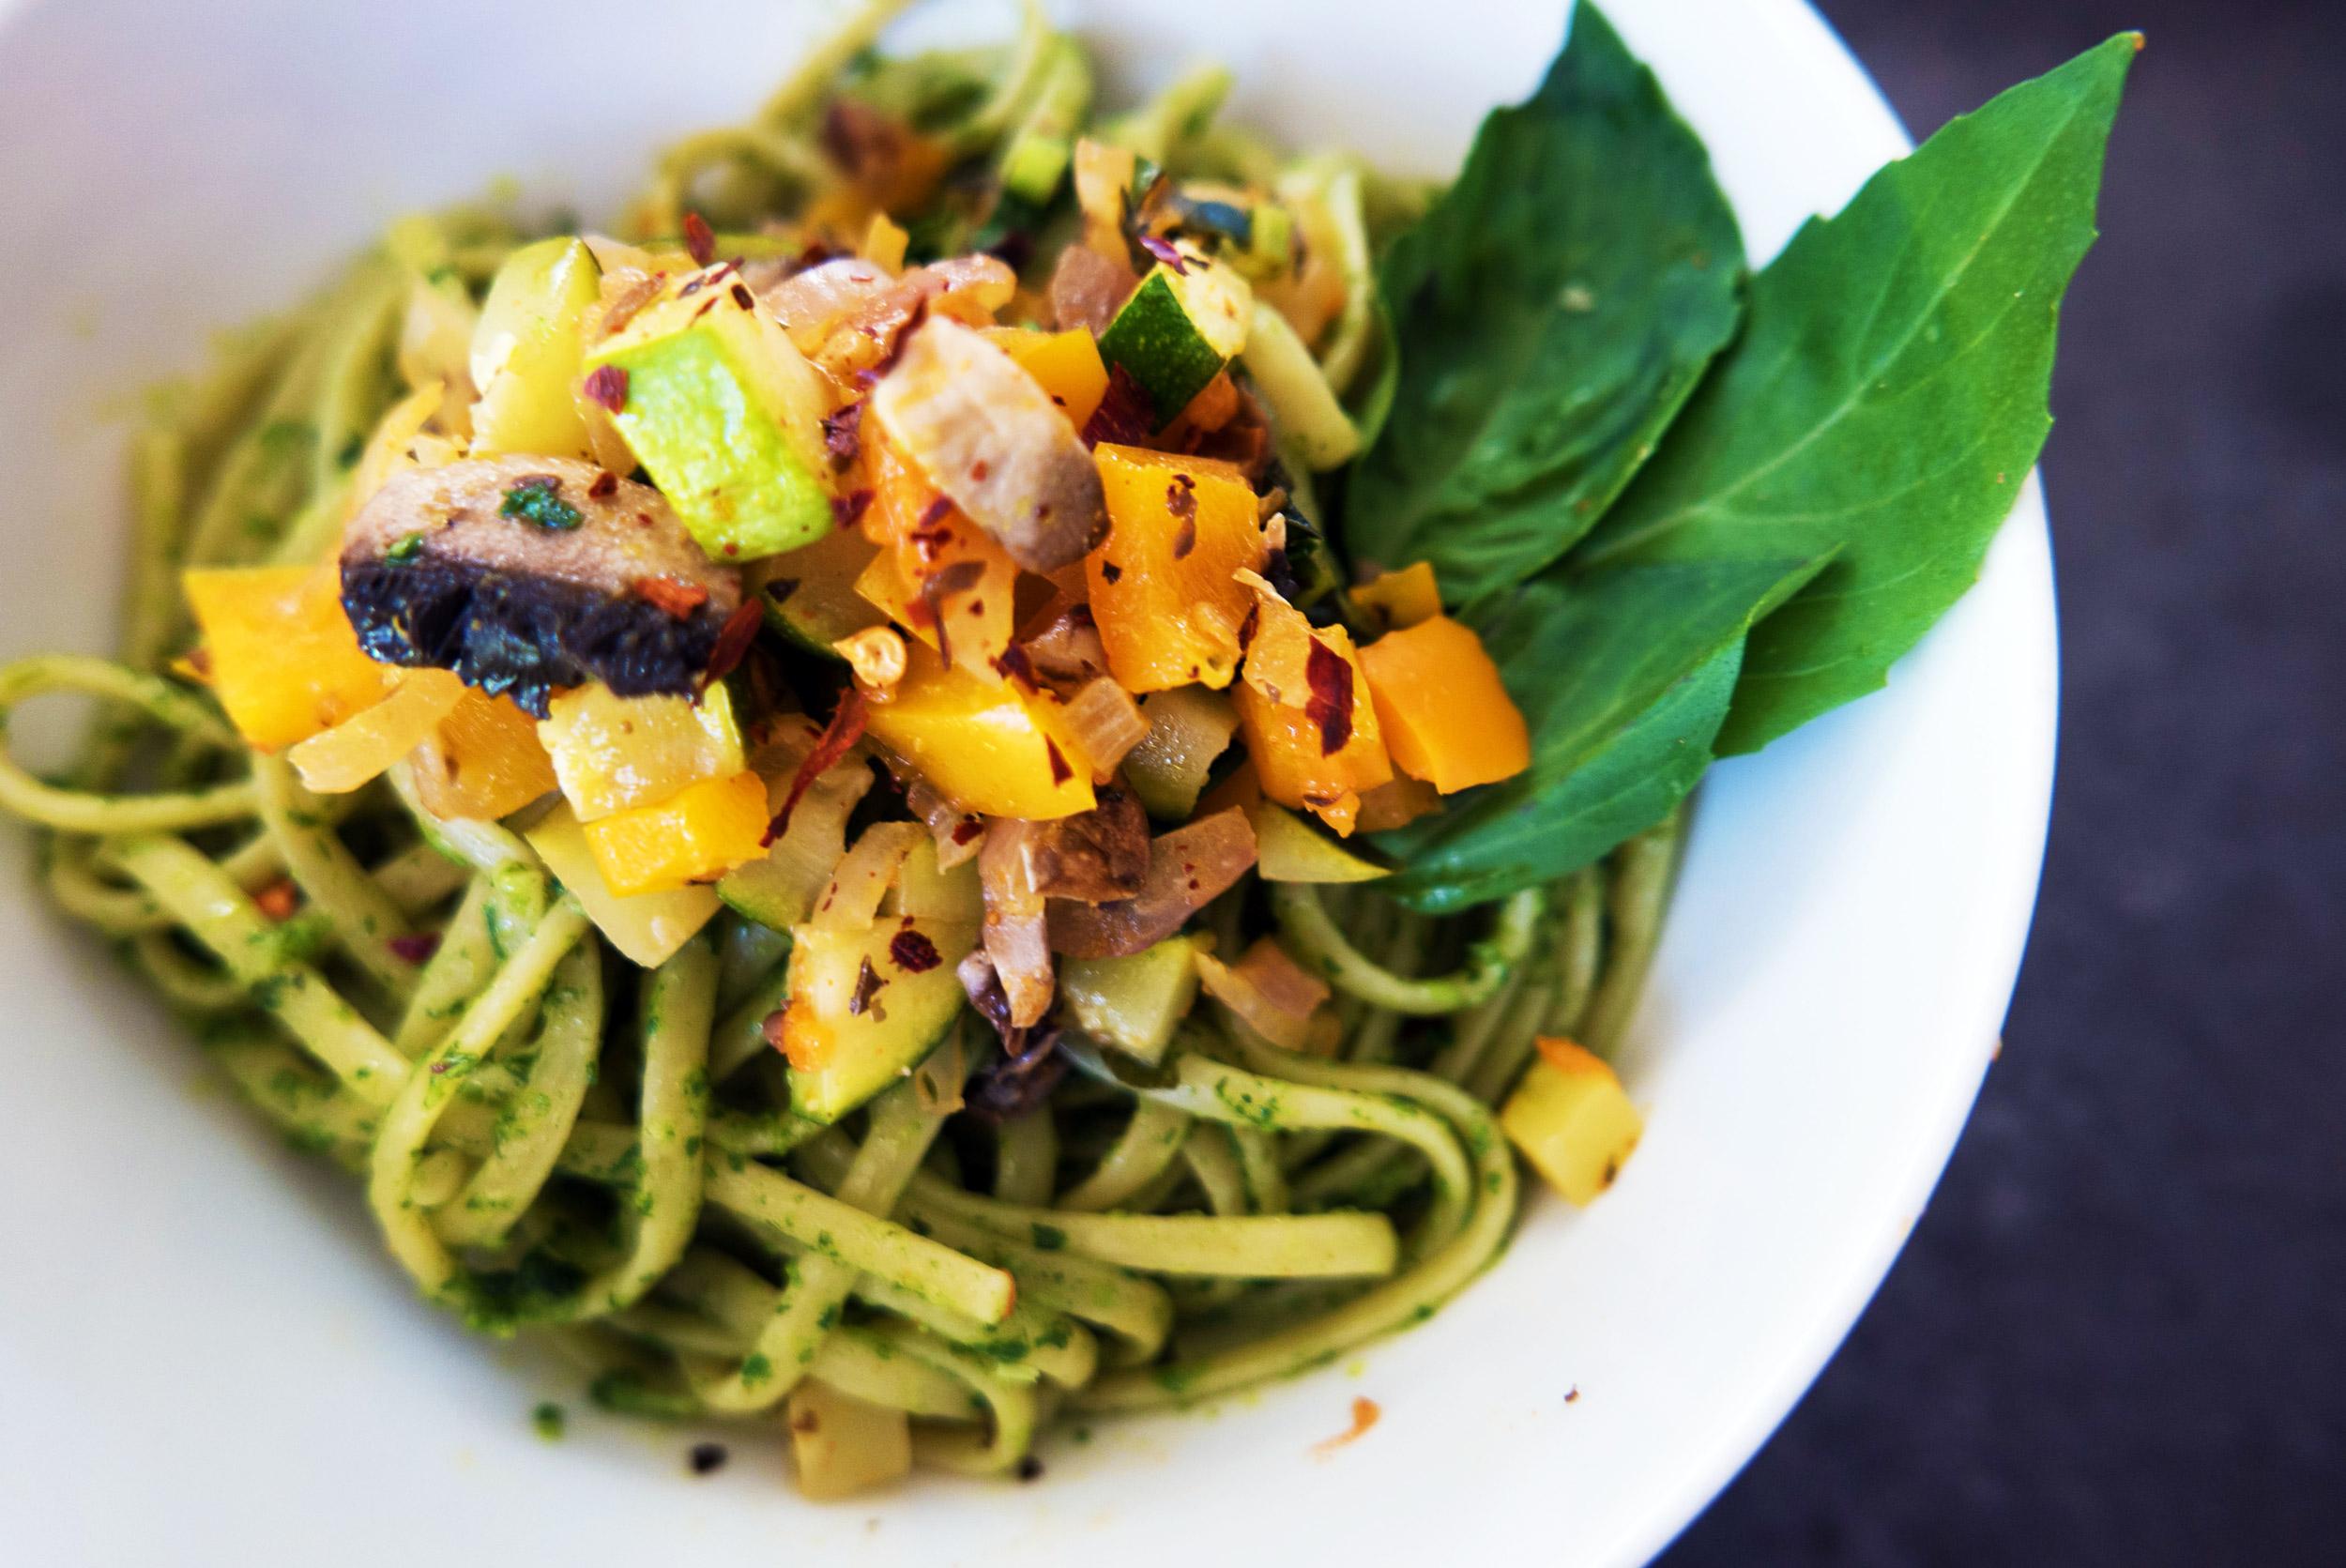 Thursday - Toast + Hummus | Quinoa, Squash, Kale + Avo | Pesto Pasta + Veggies